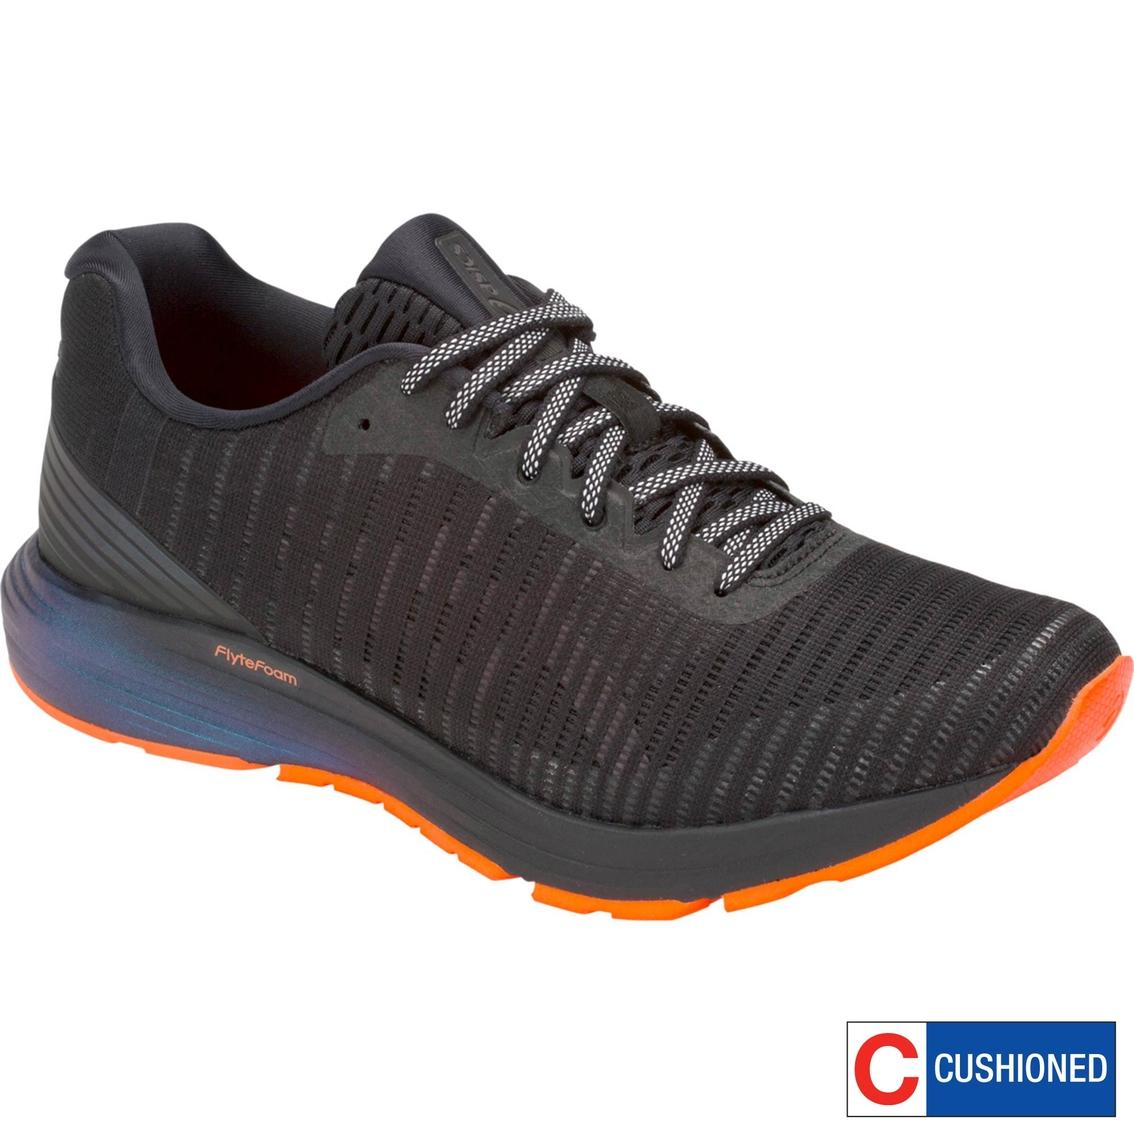 cd9f6f63c Asics Men's Dynaflyte 4 Lite-show Running Shoes | Running | Back To ...